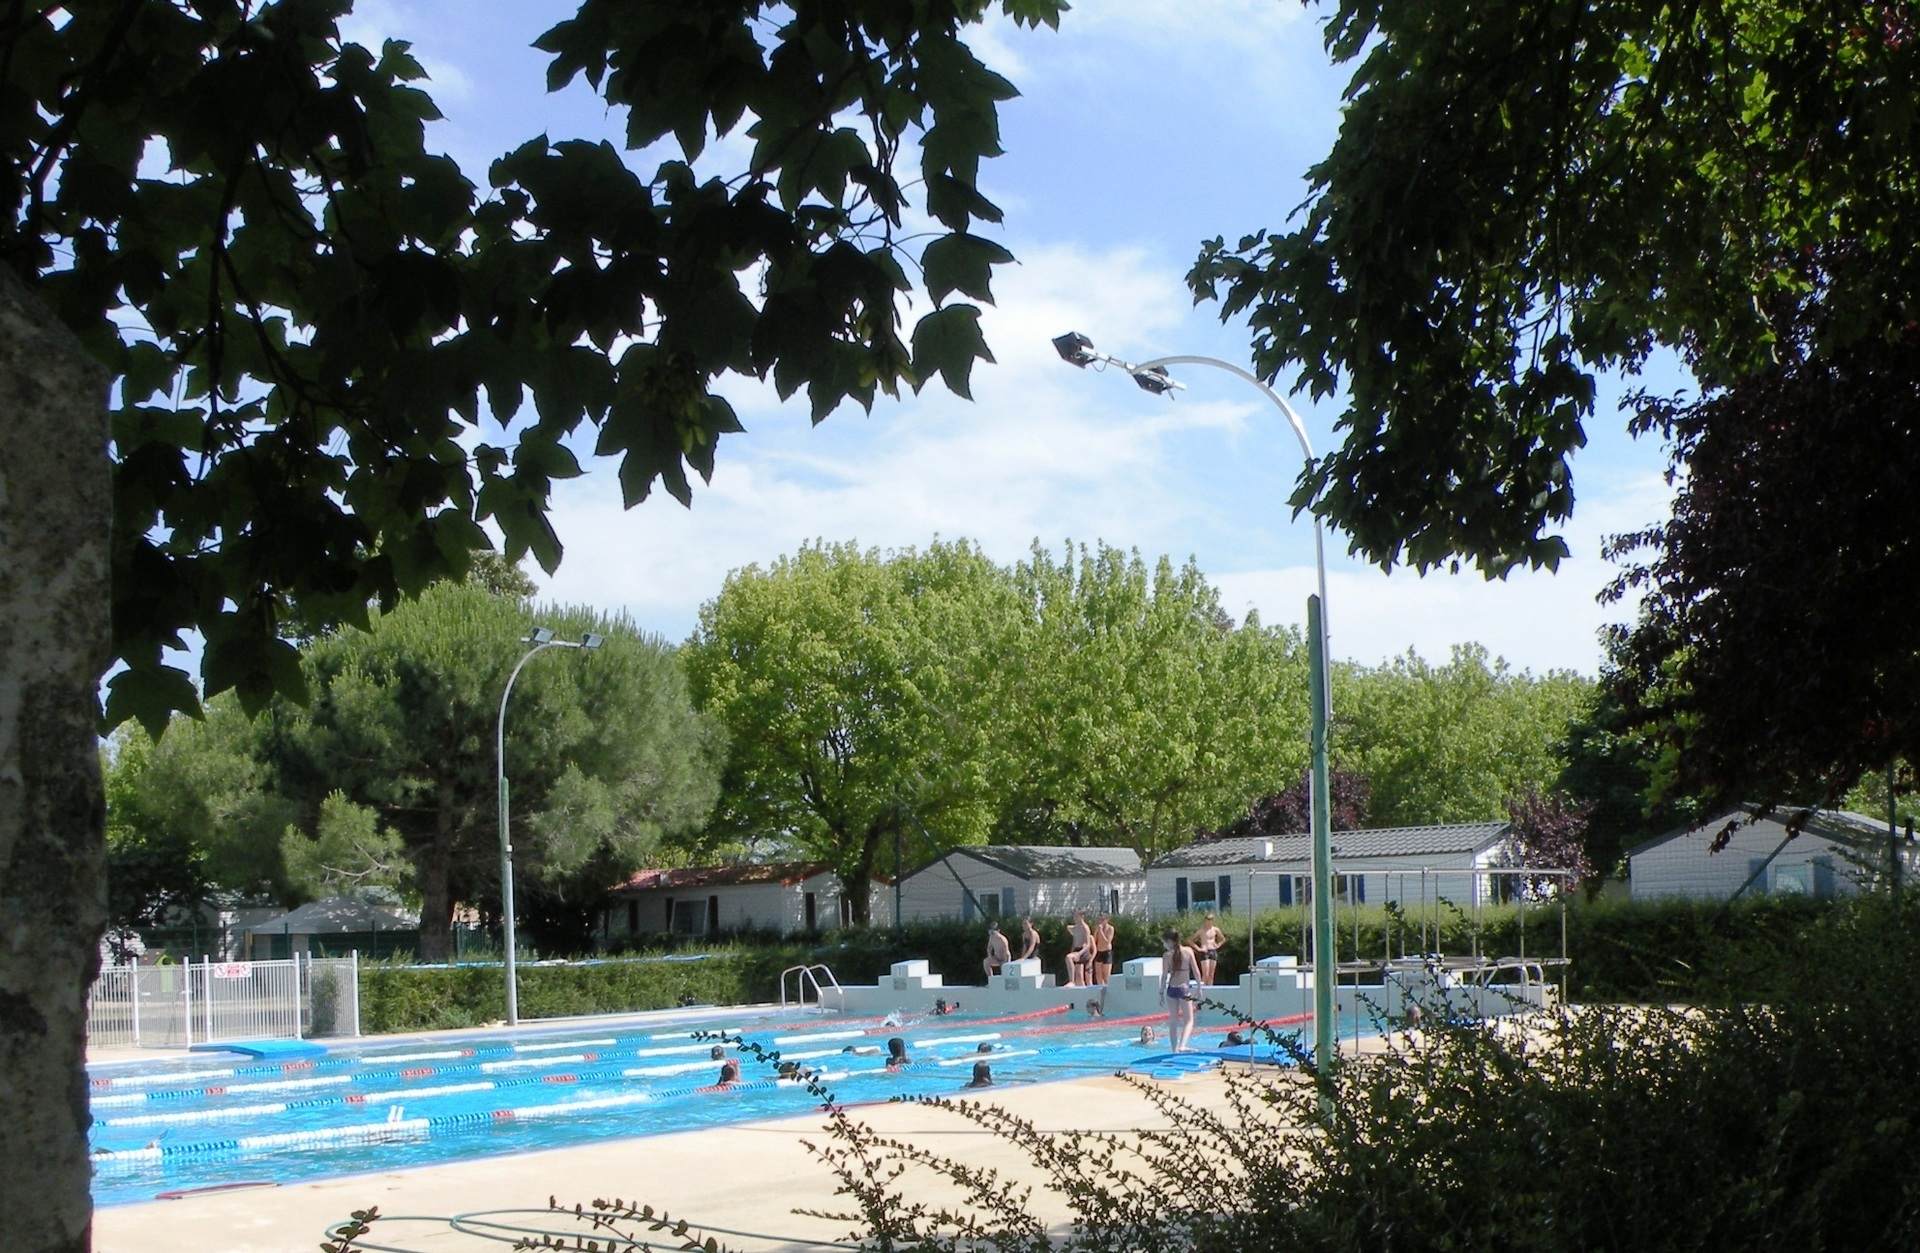 Frankrijk-Courcon-Camping%20La%20Mouette%20Rieuse-ExtraLarge Wintersport Frankrijk Pagina 3 van 55